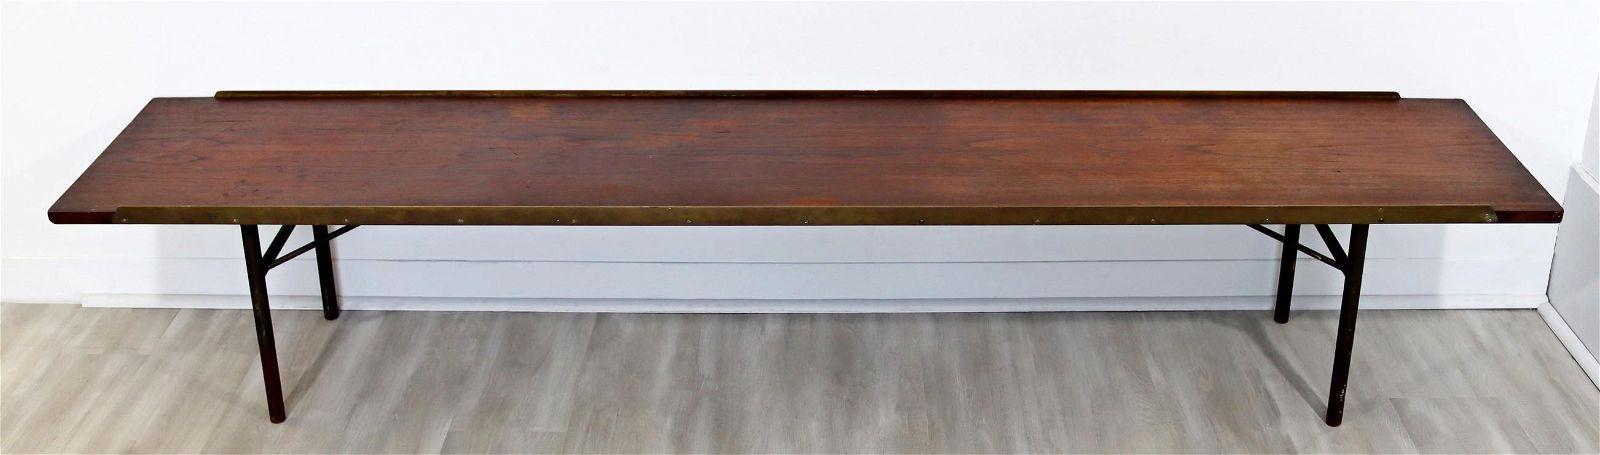 Danish Teak/Brass Long Bench Seat Coffee Table